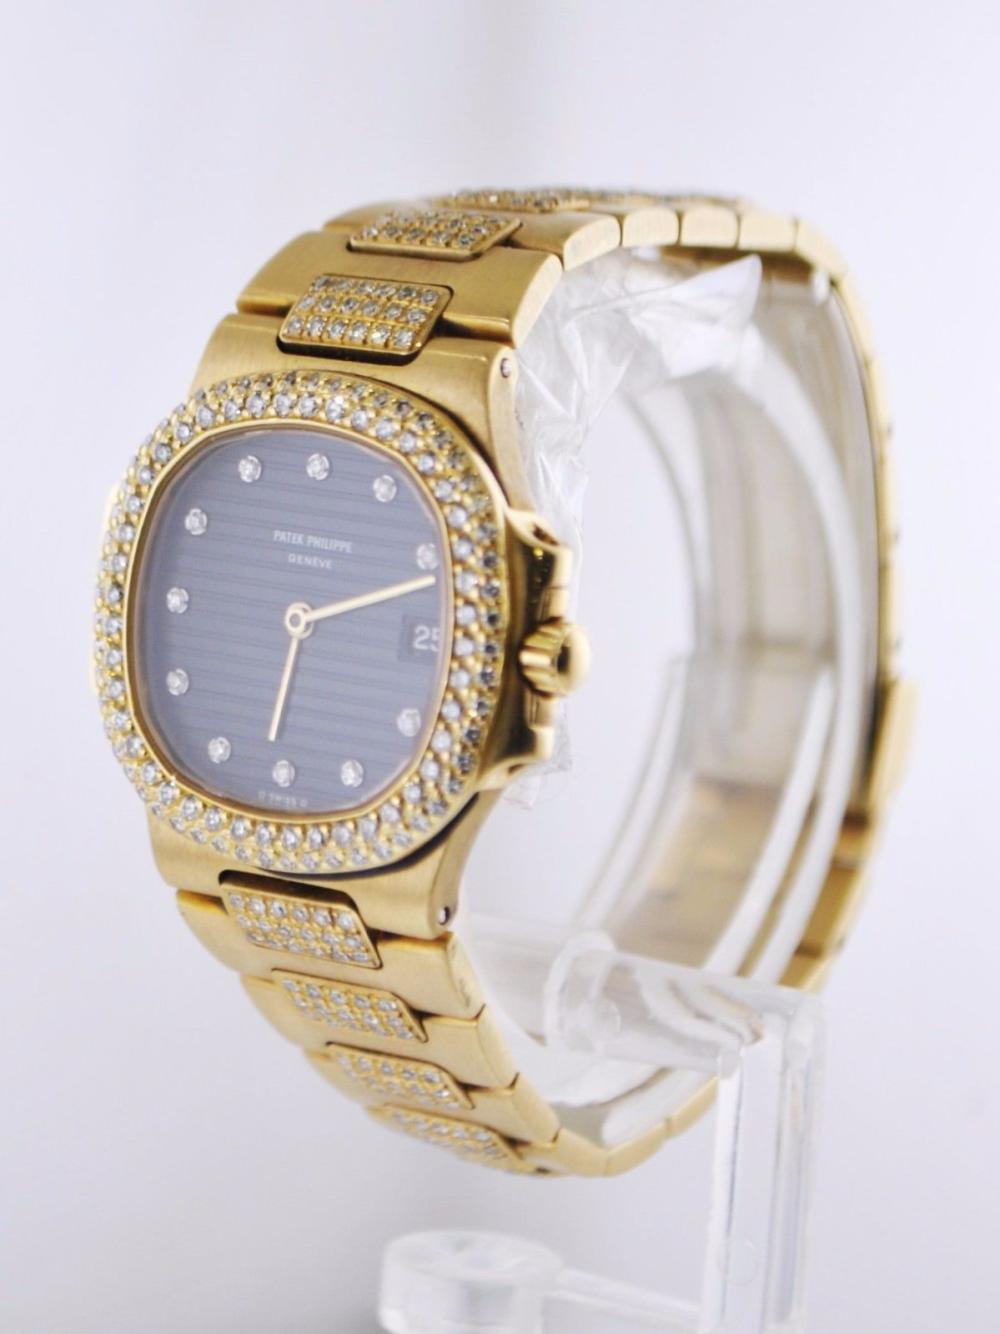 Patek Philippe Nautilus Factory Diamond Lady S Wristwatch Da